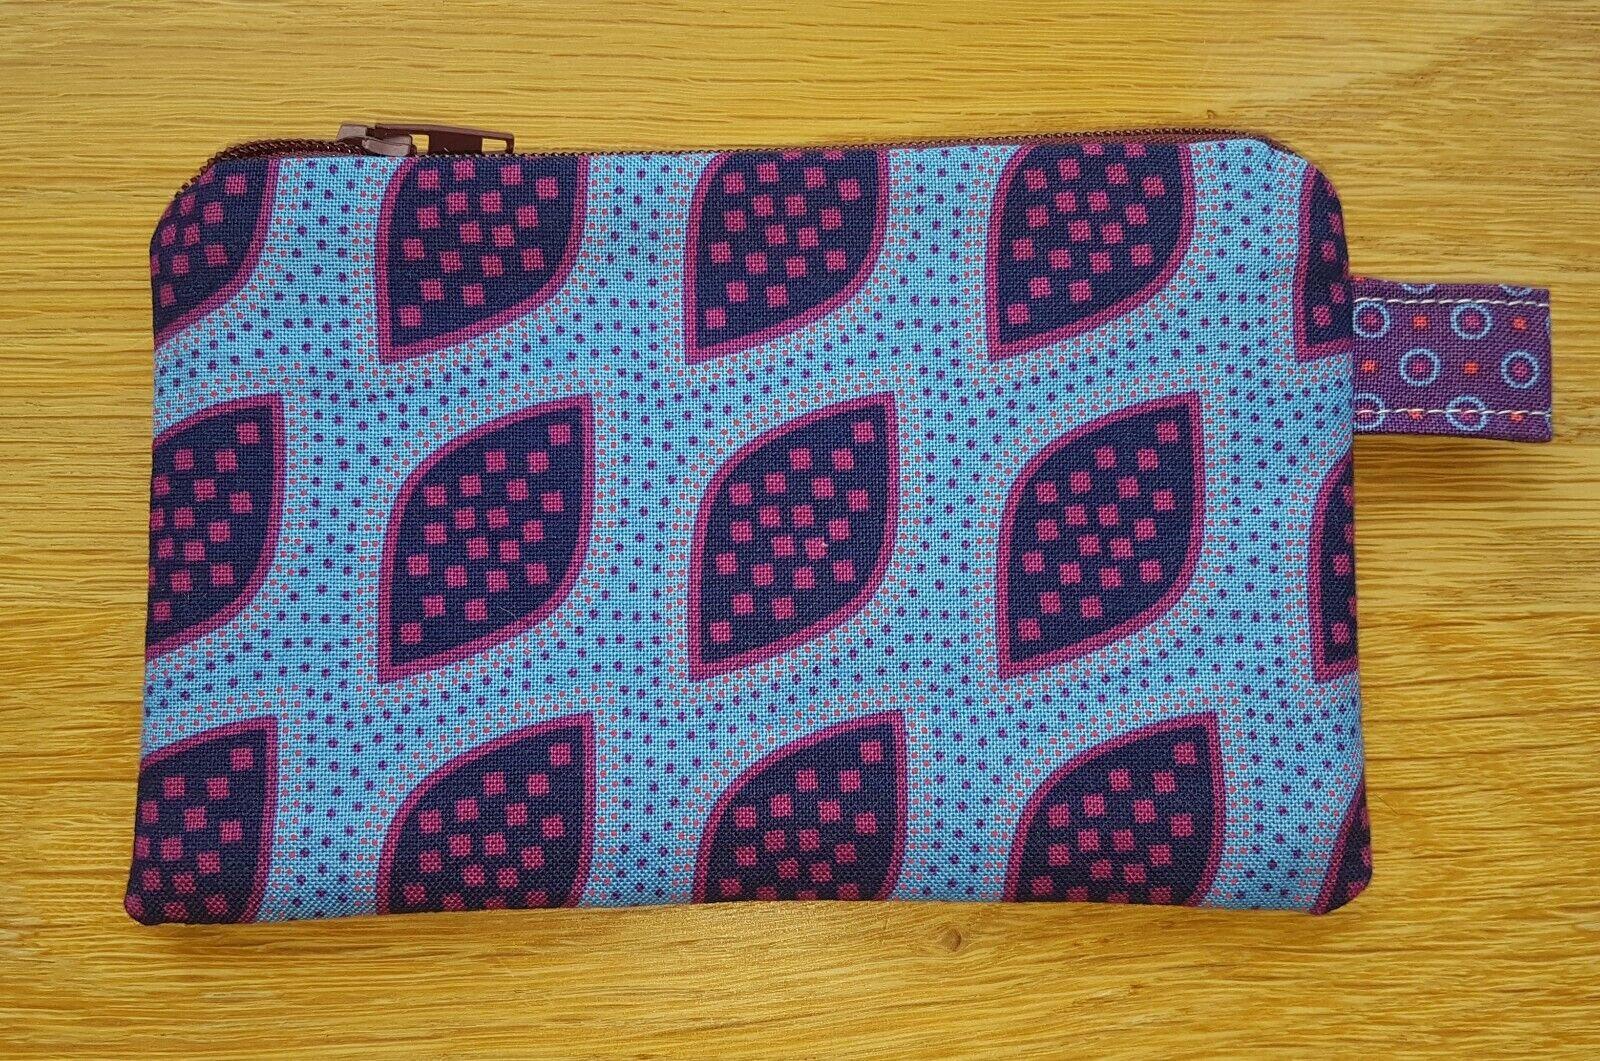 LEAF zipped pouch coin purse free 1st class p & p Makoti Stuart Hillard fabric